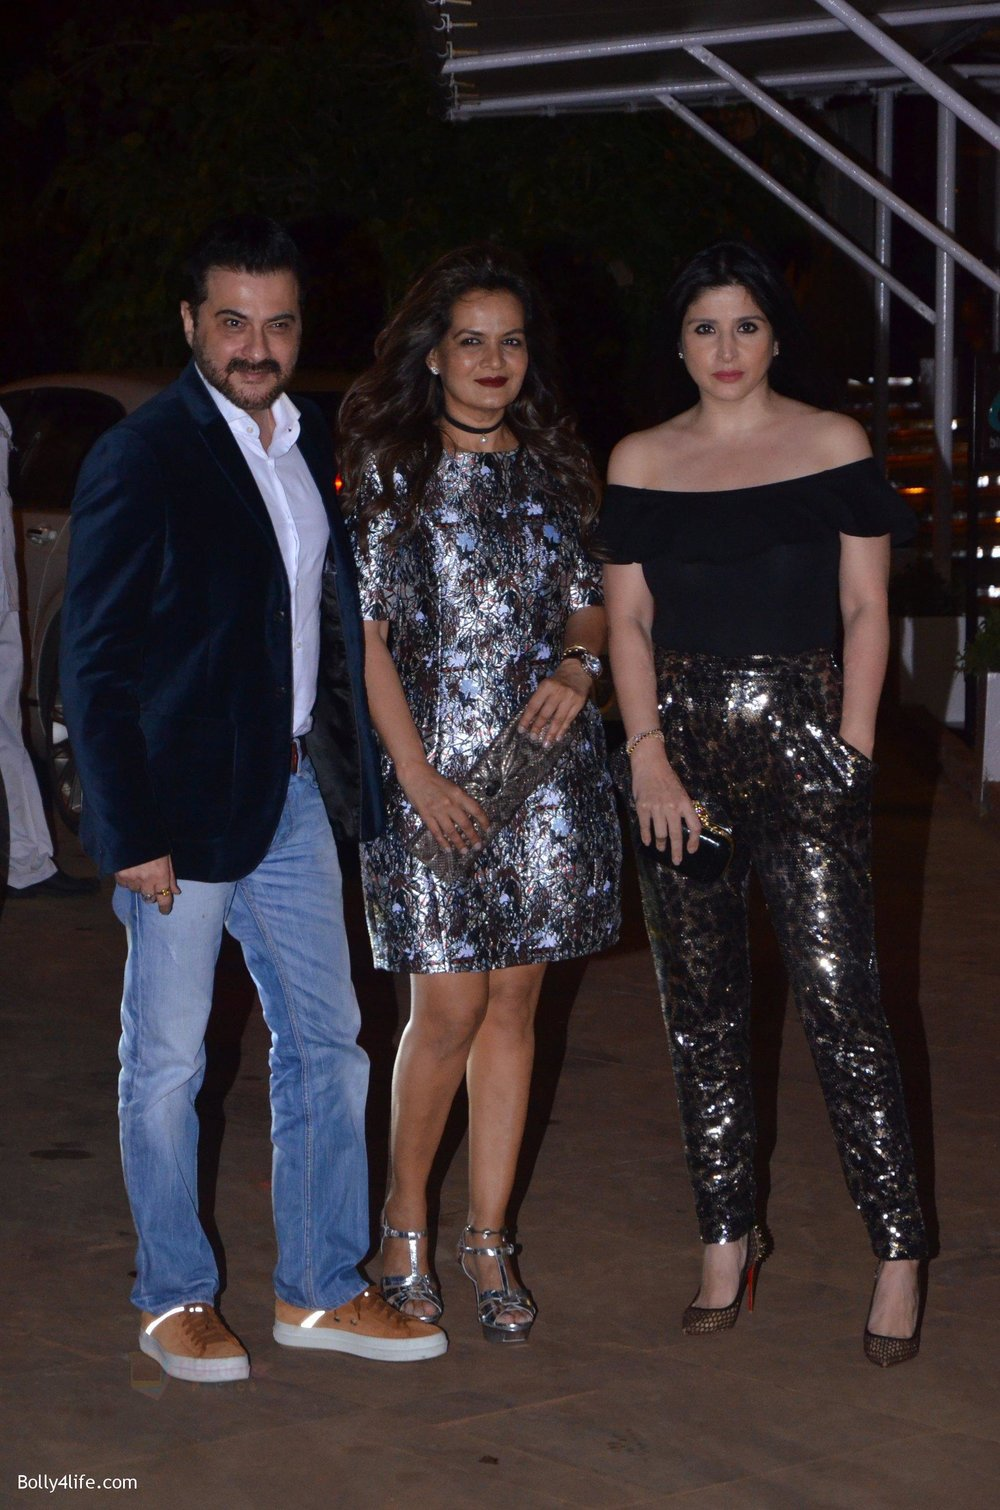 Sanjay-Kapoor-at-Reema-jain-bday-party-in-Amadeus-NCPA-on-28th-Sept-2016-894.jpg